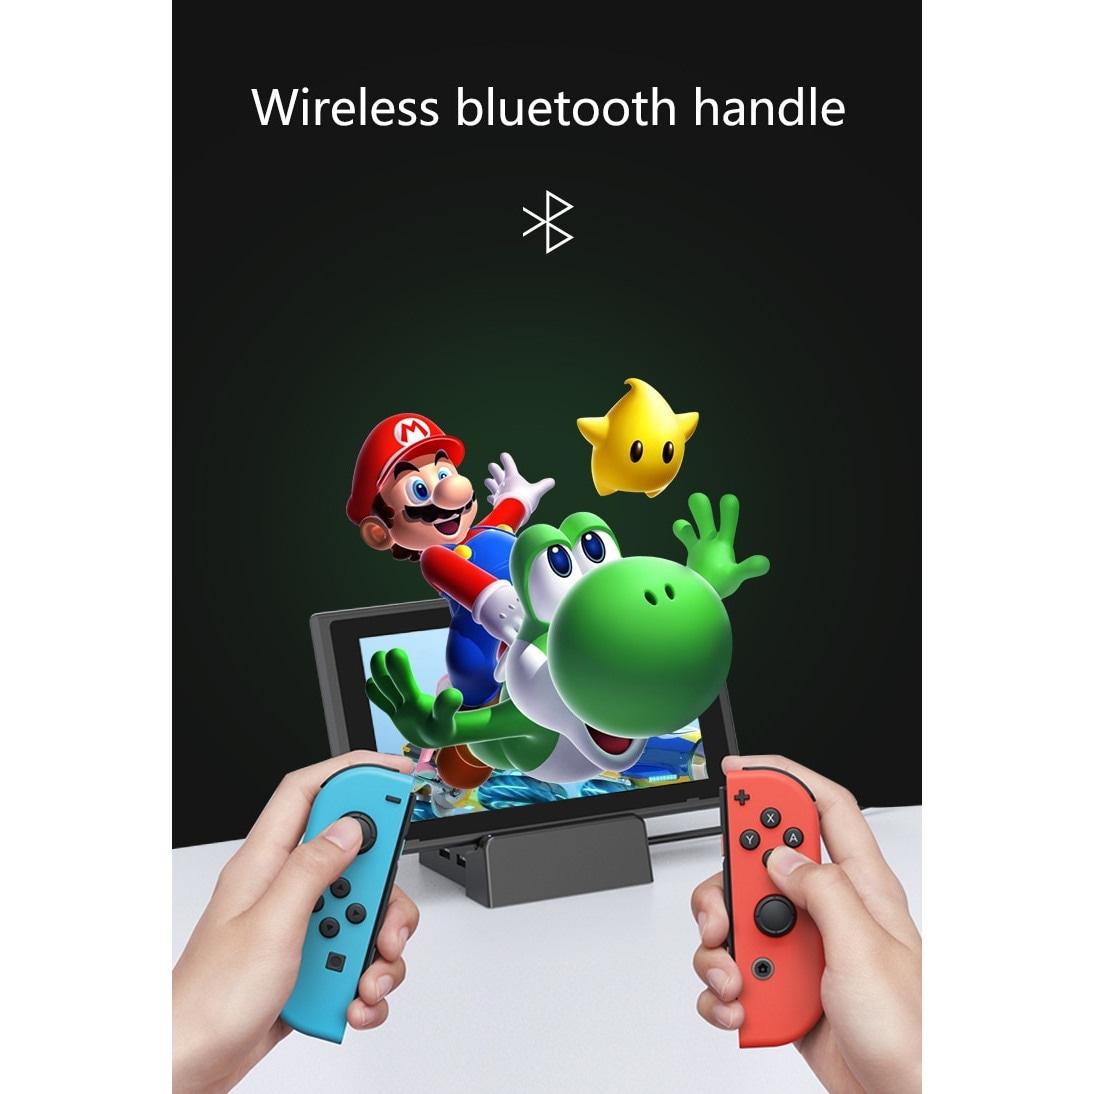 Wireless Joysticks for Nintendo Switch (L and R) Yellow - 4